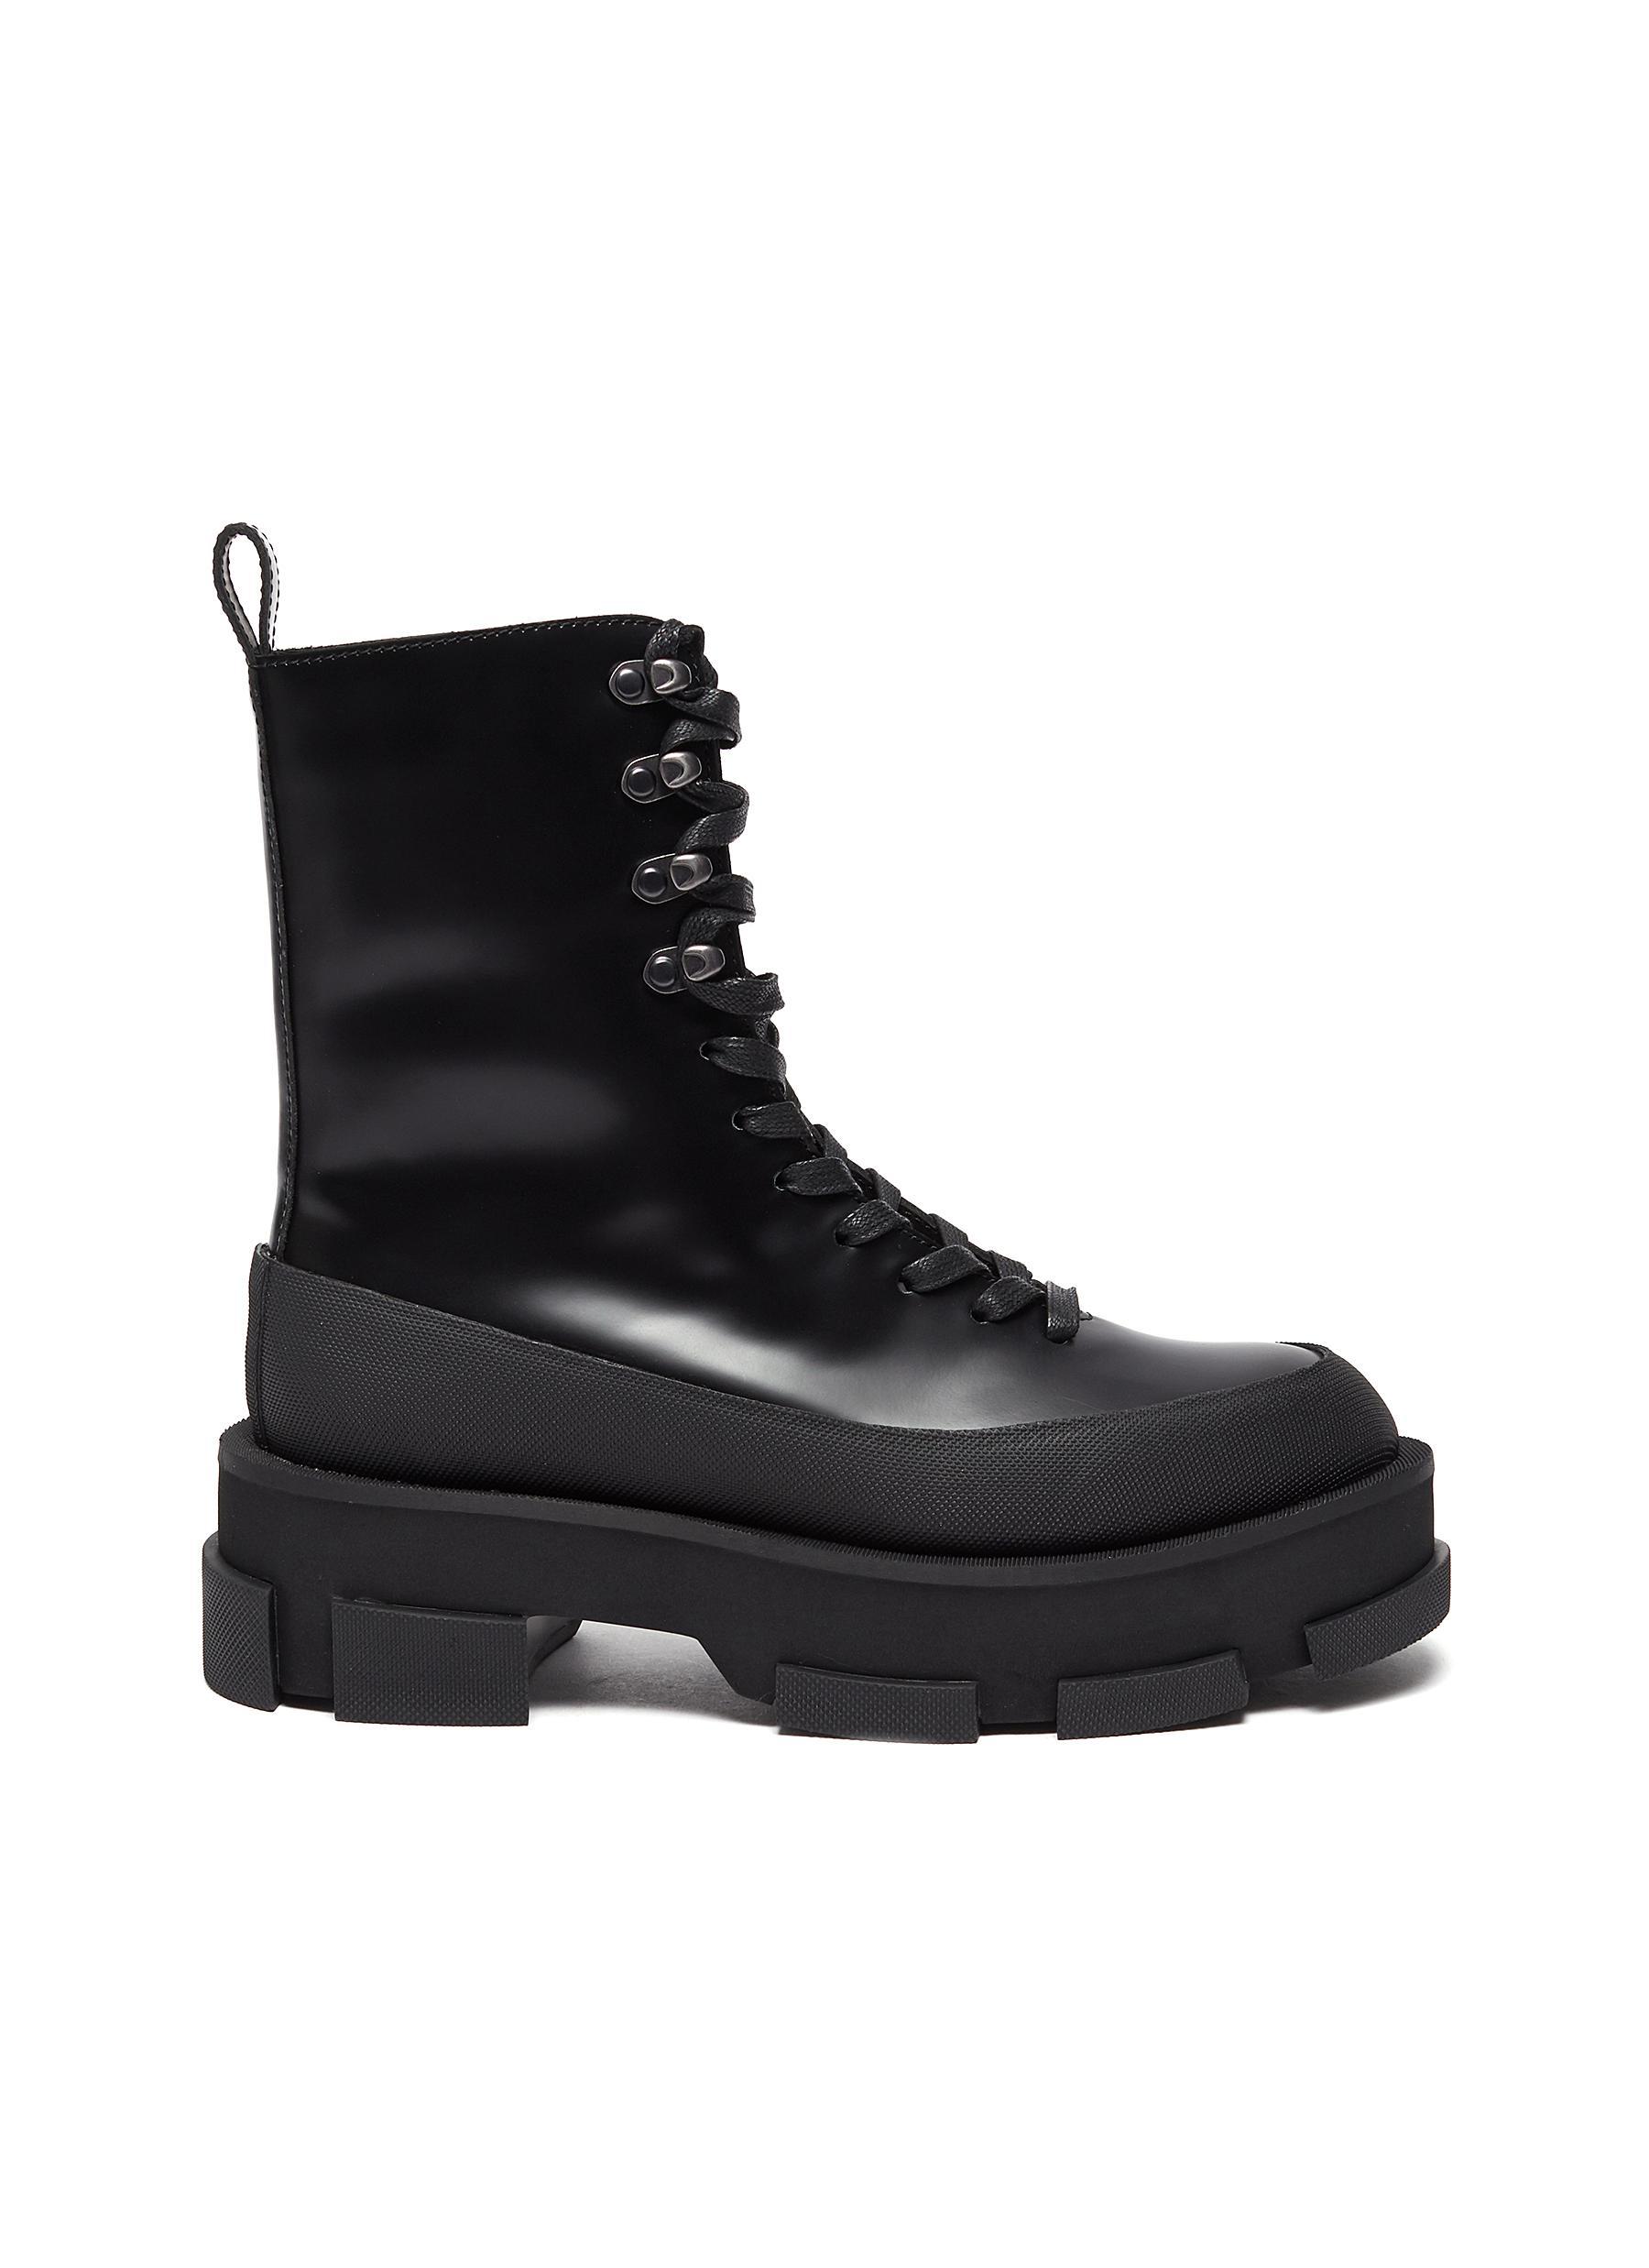 'Gao' platform leather combat boots